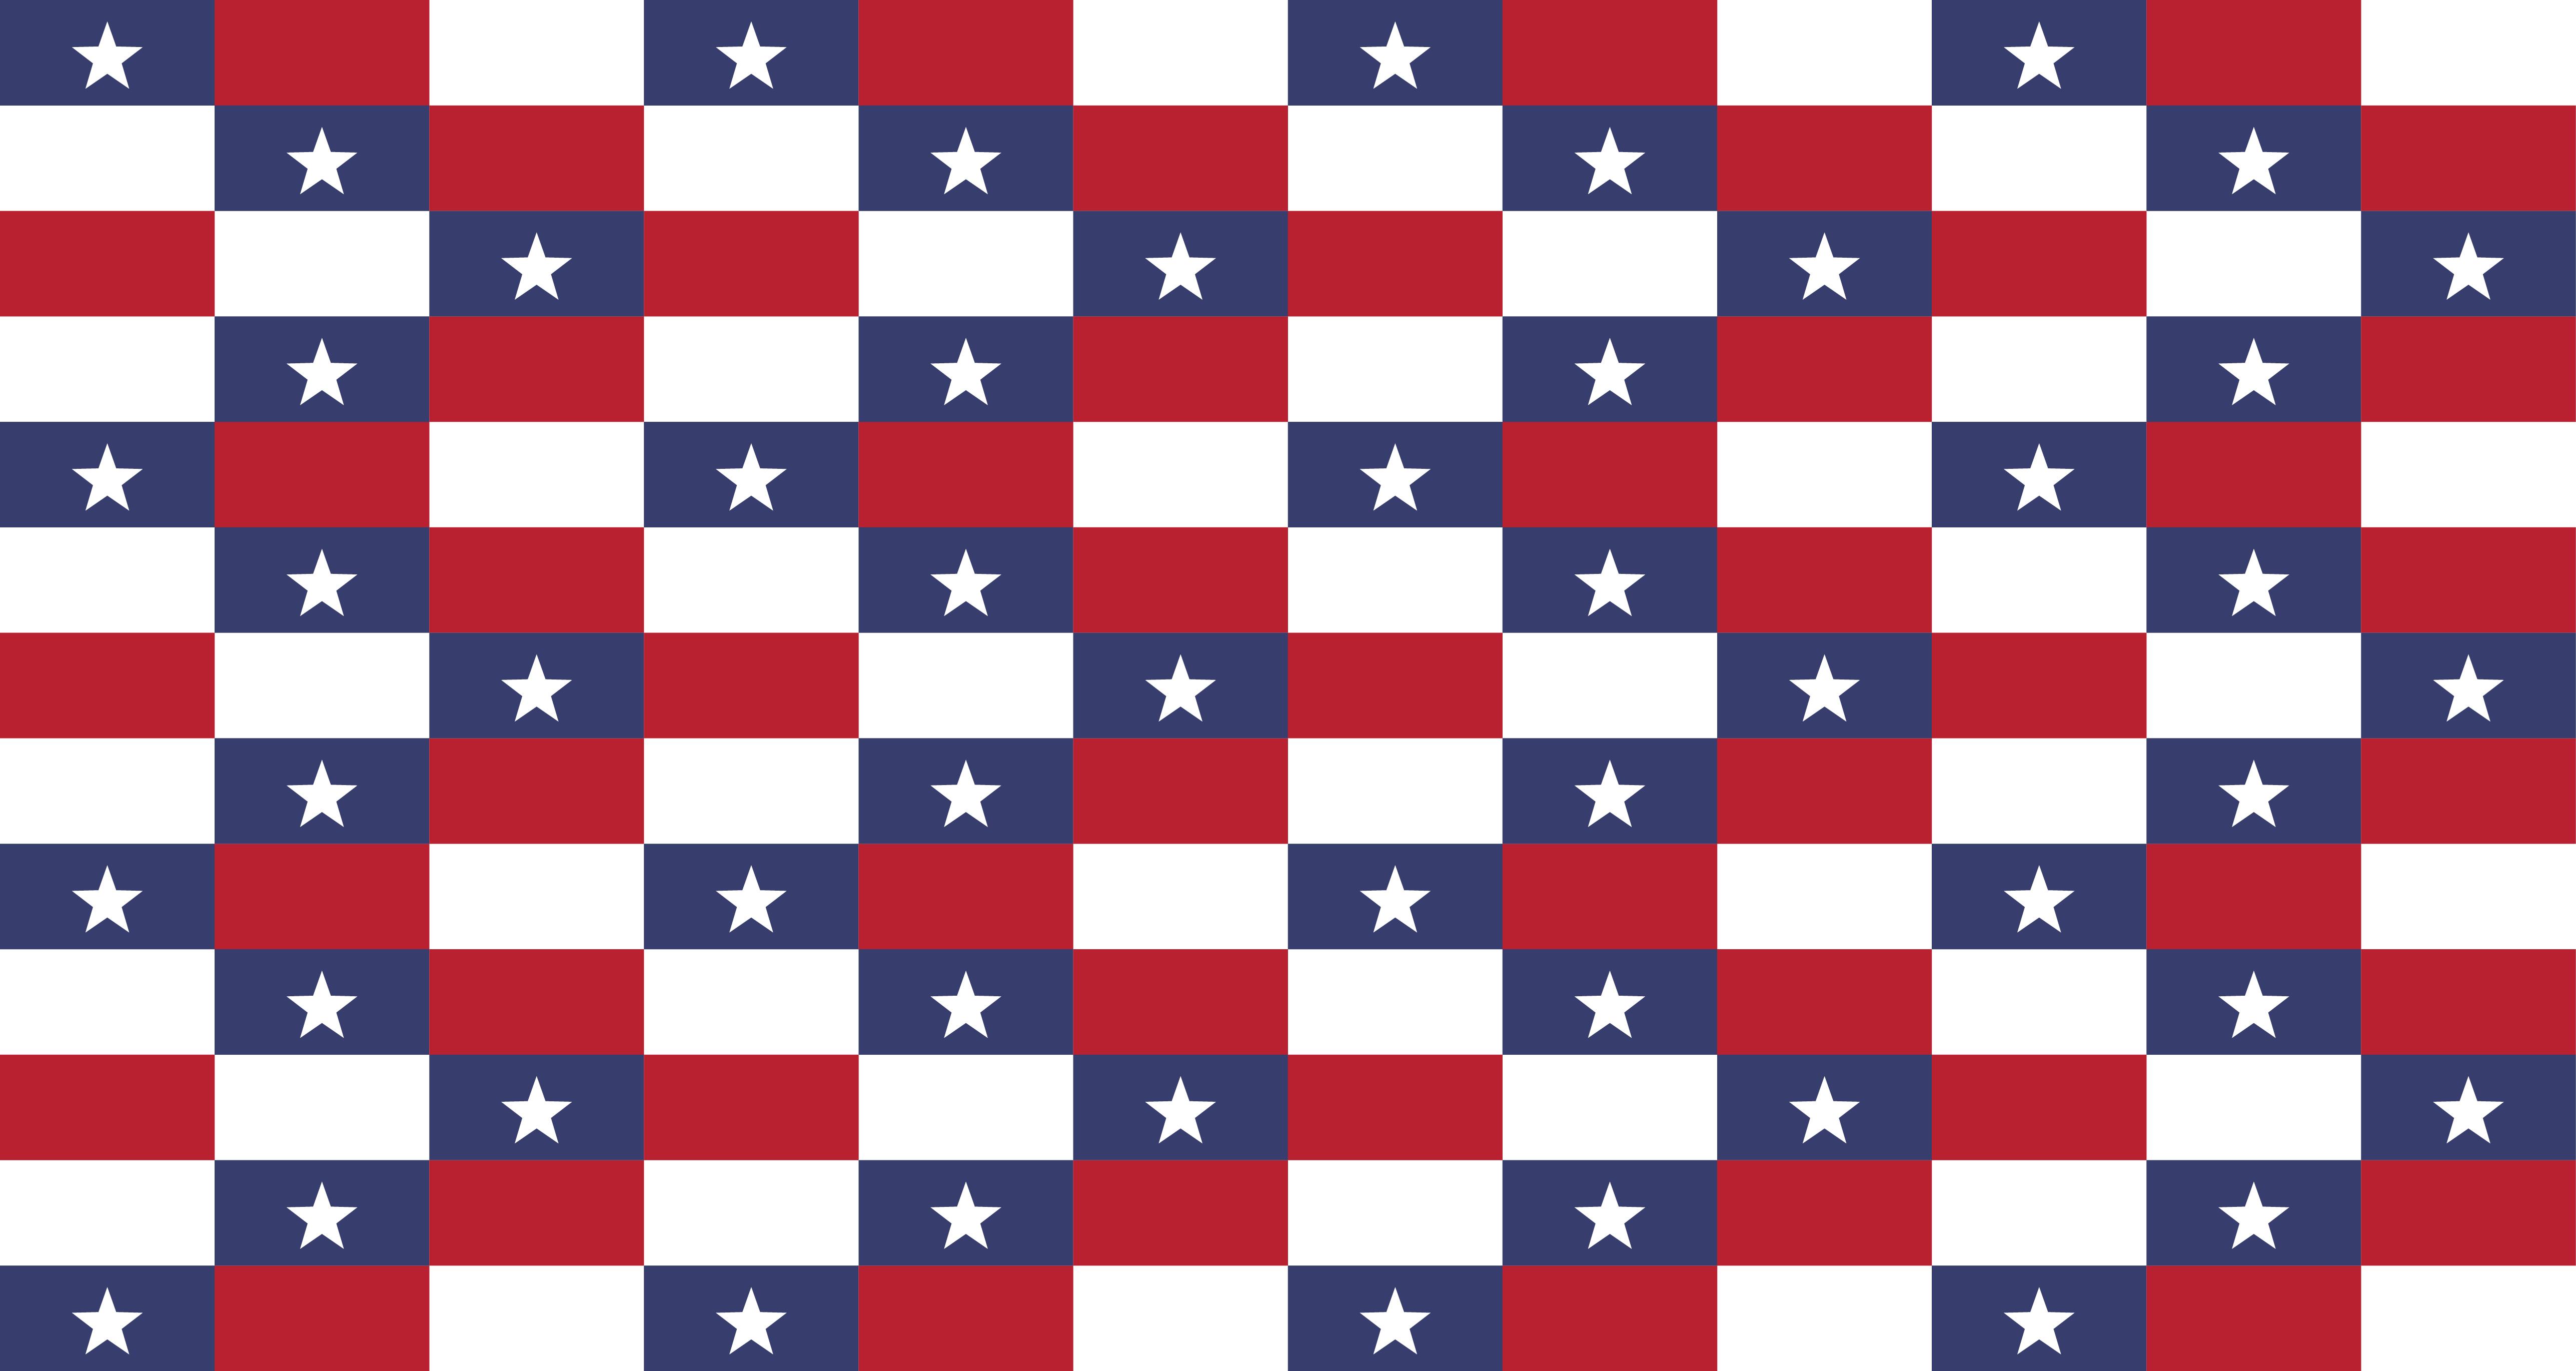 American_flag_3